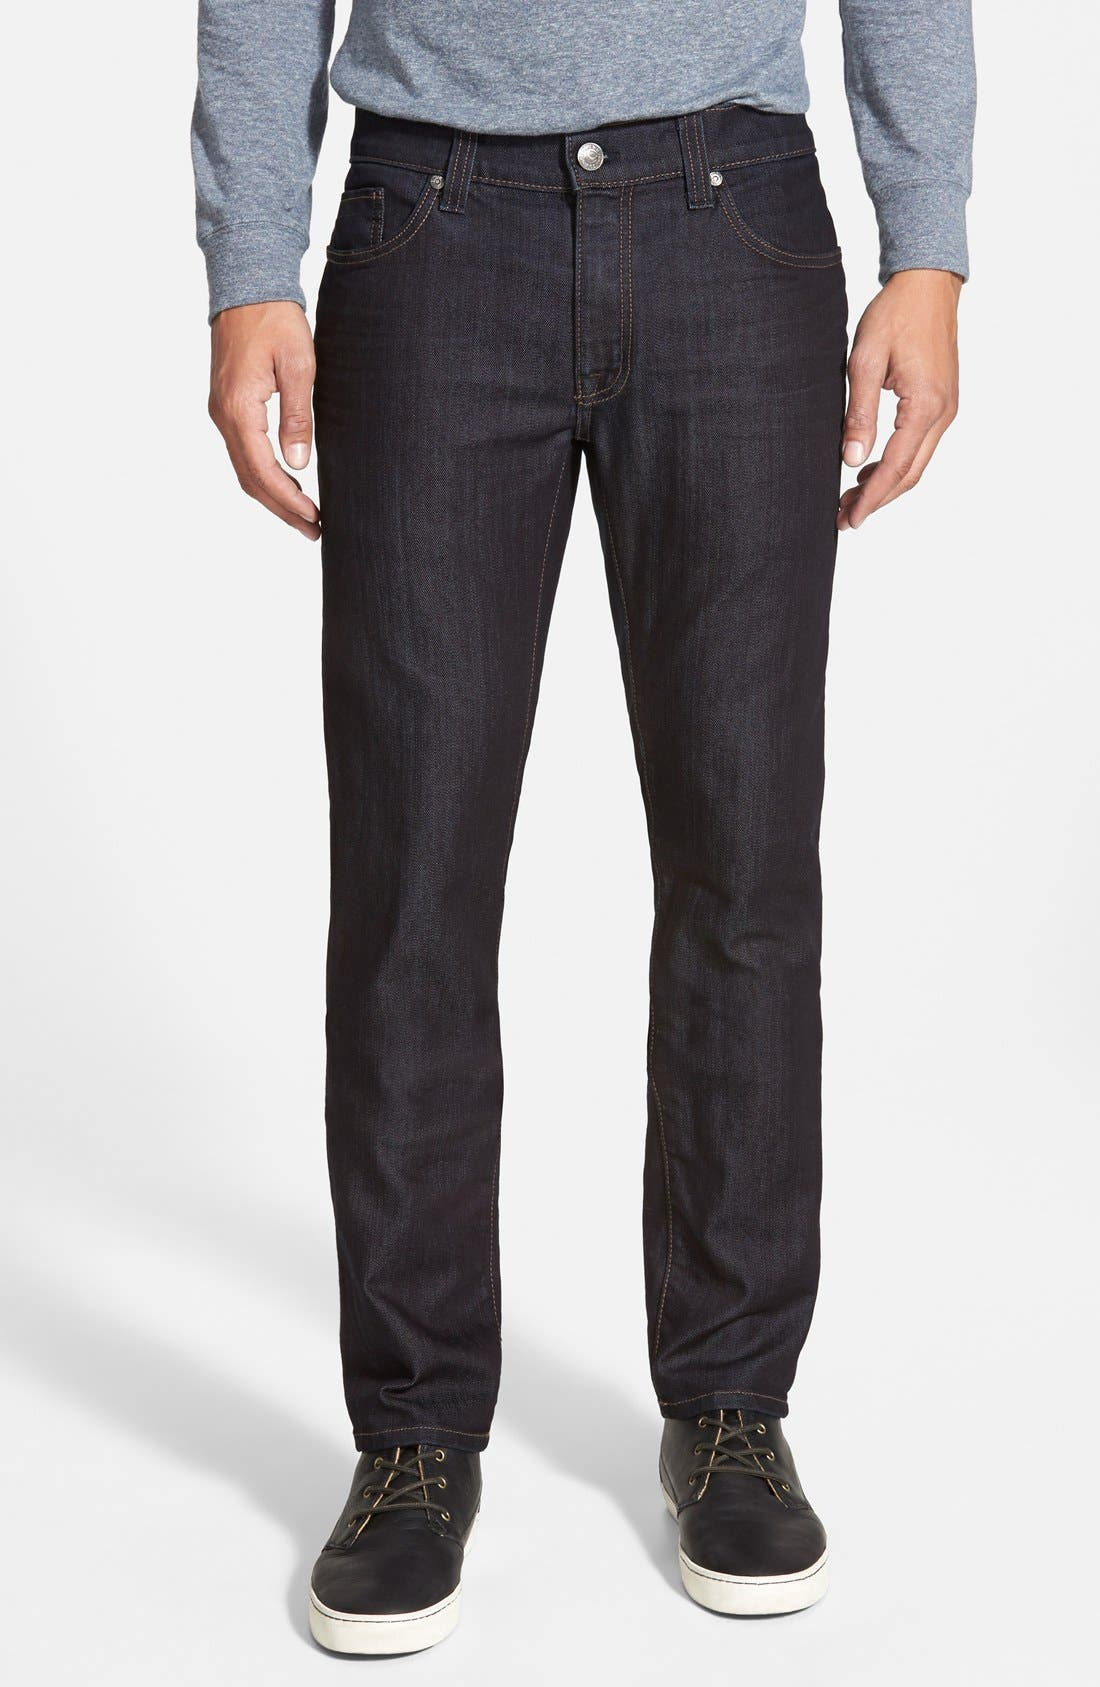 Fidelity Denim Torino Slim Fit Jeans (Revolution Rinse)